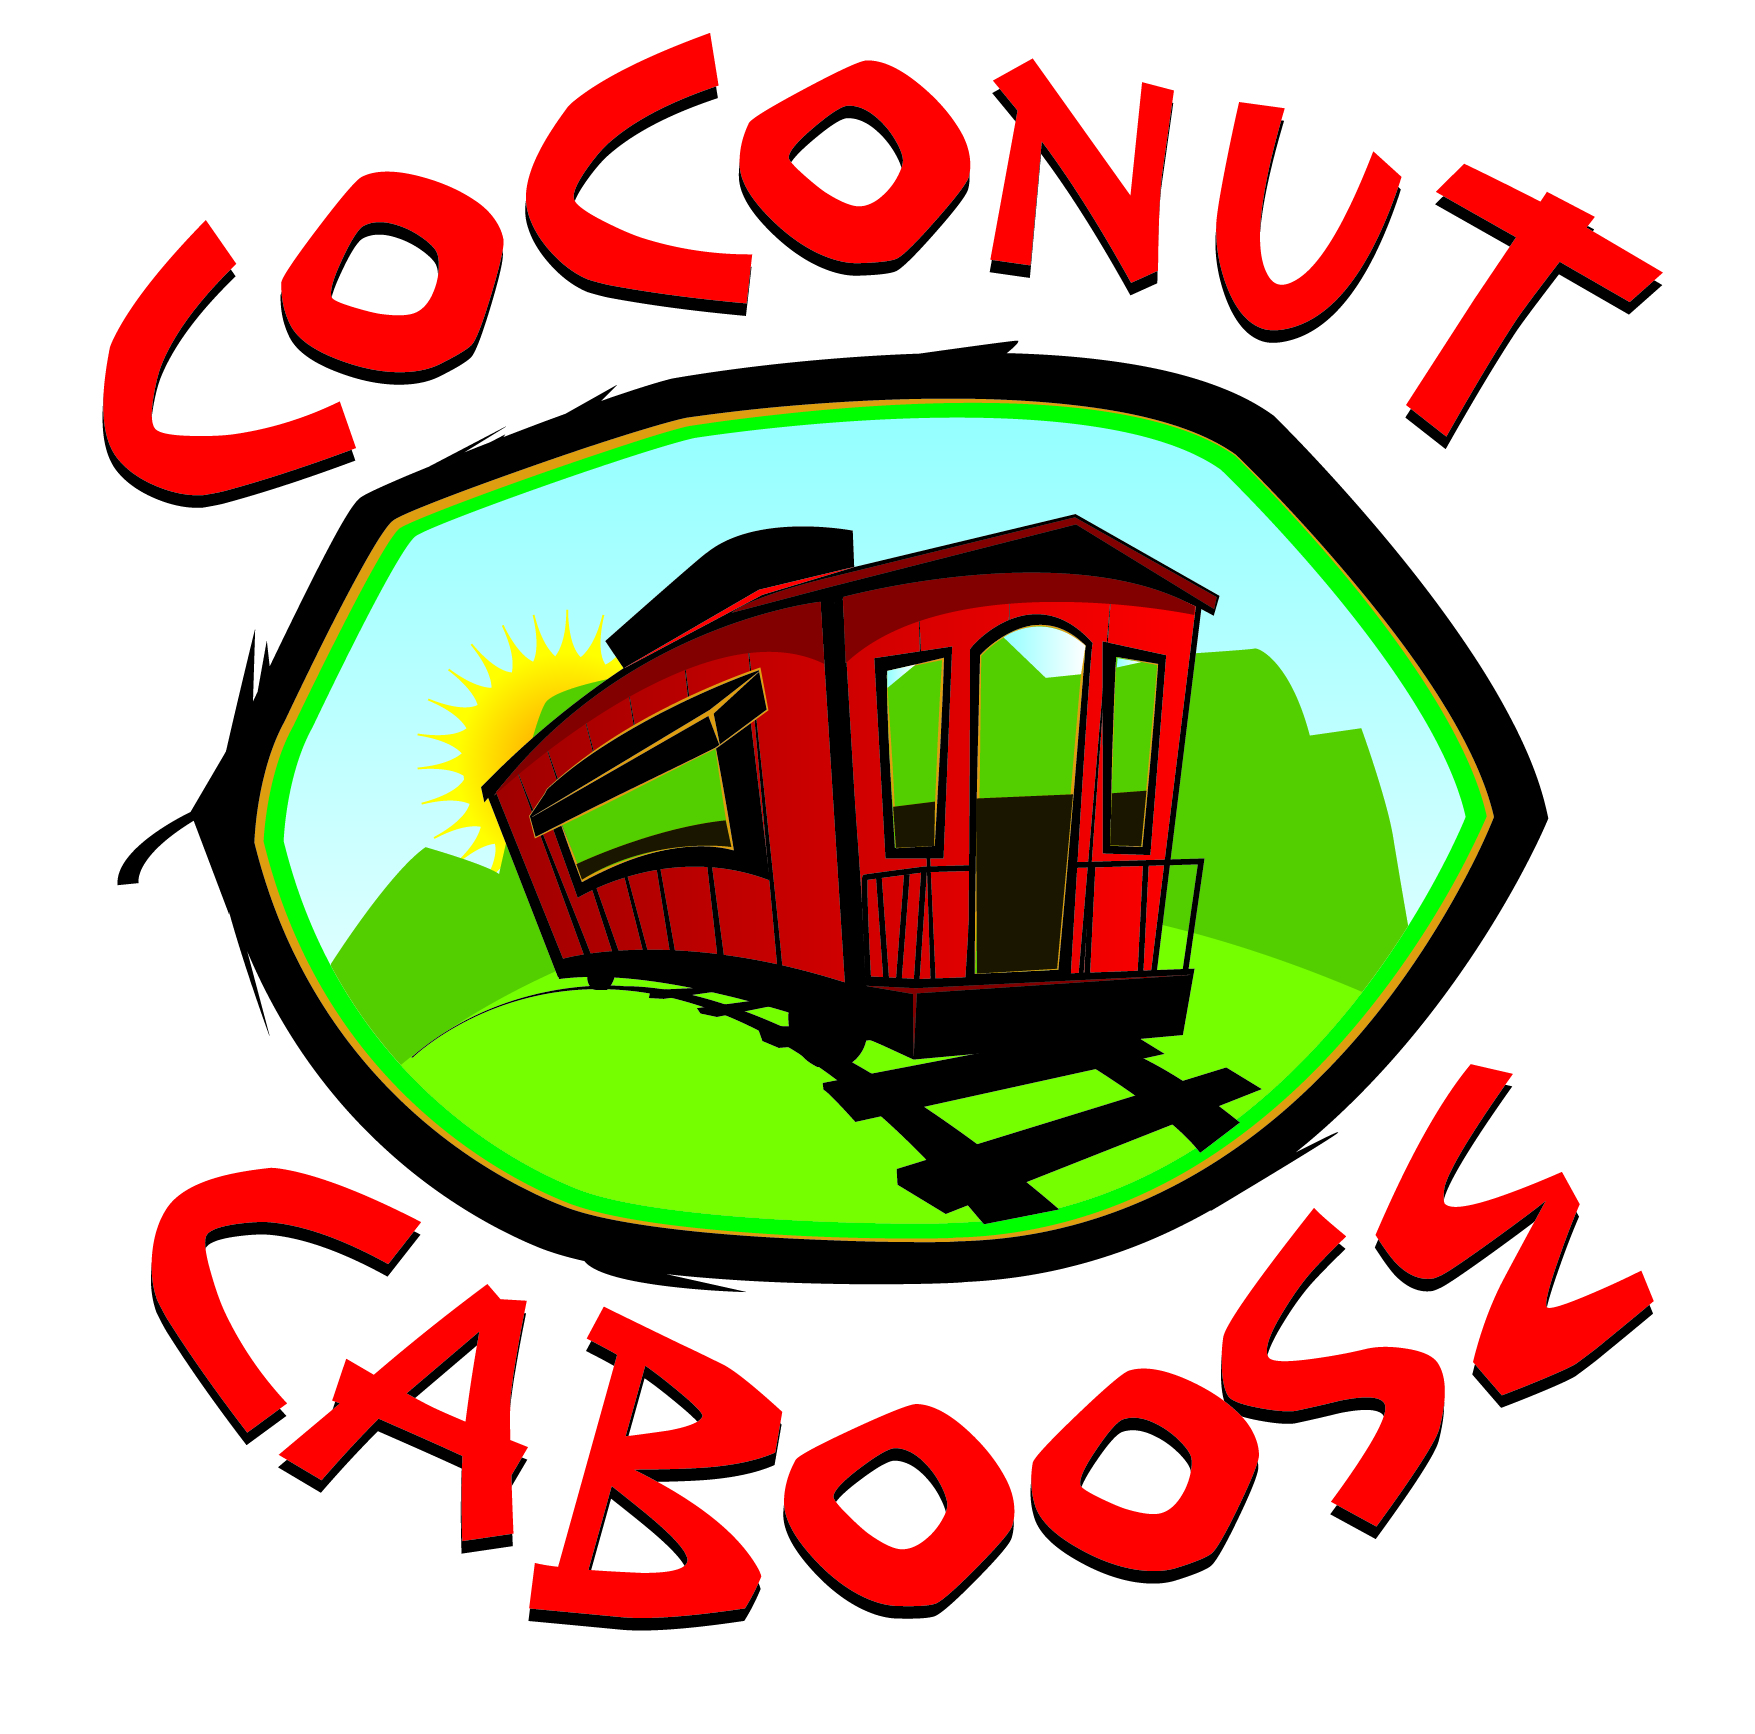 CoconutCab_logo12.15.14.jpg